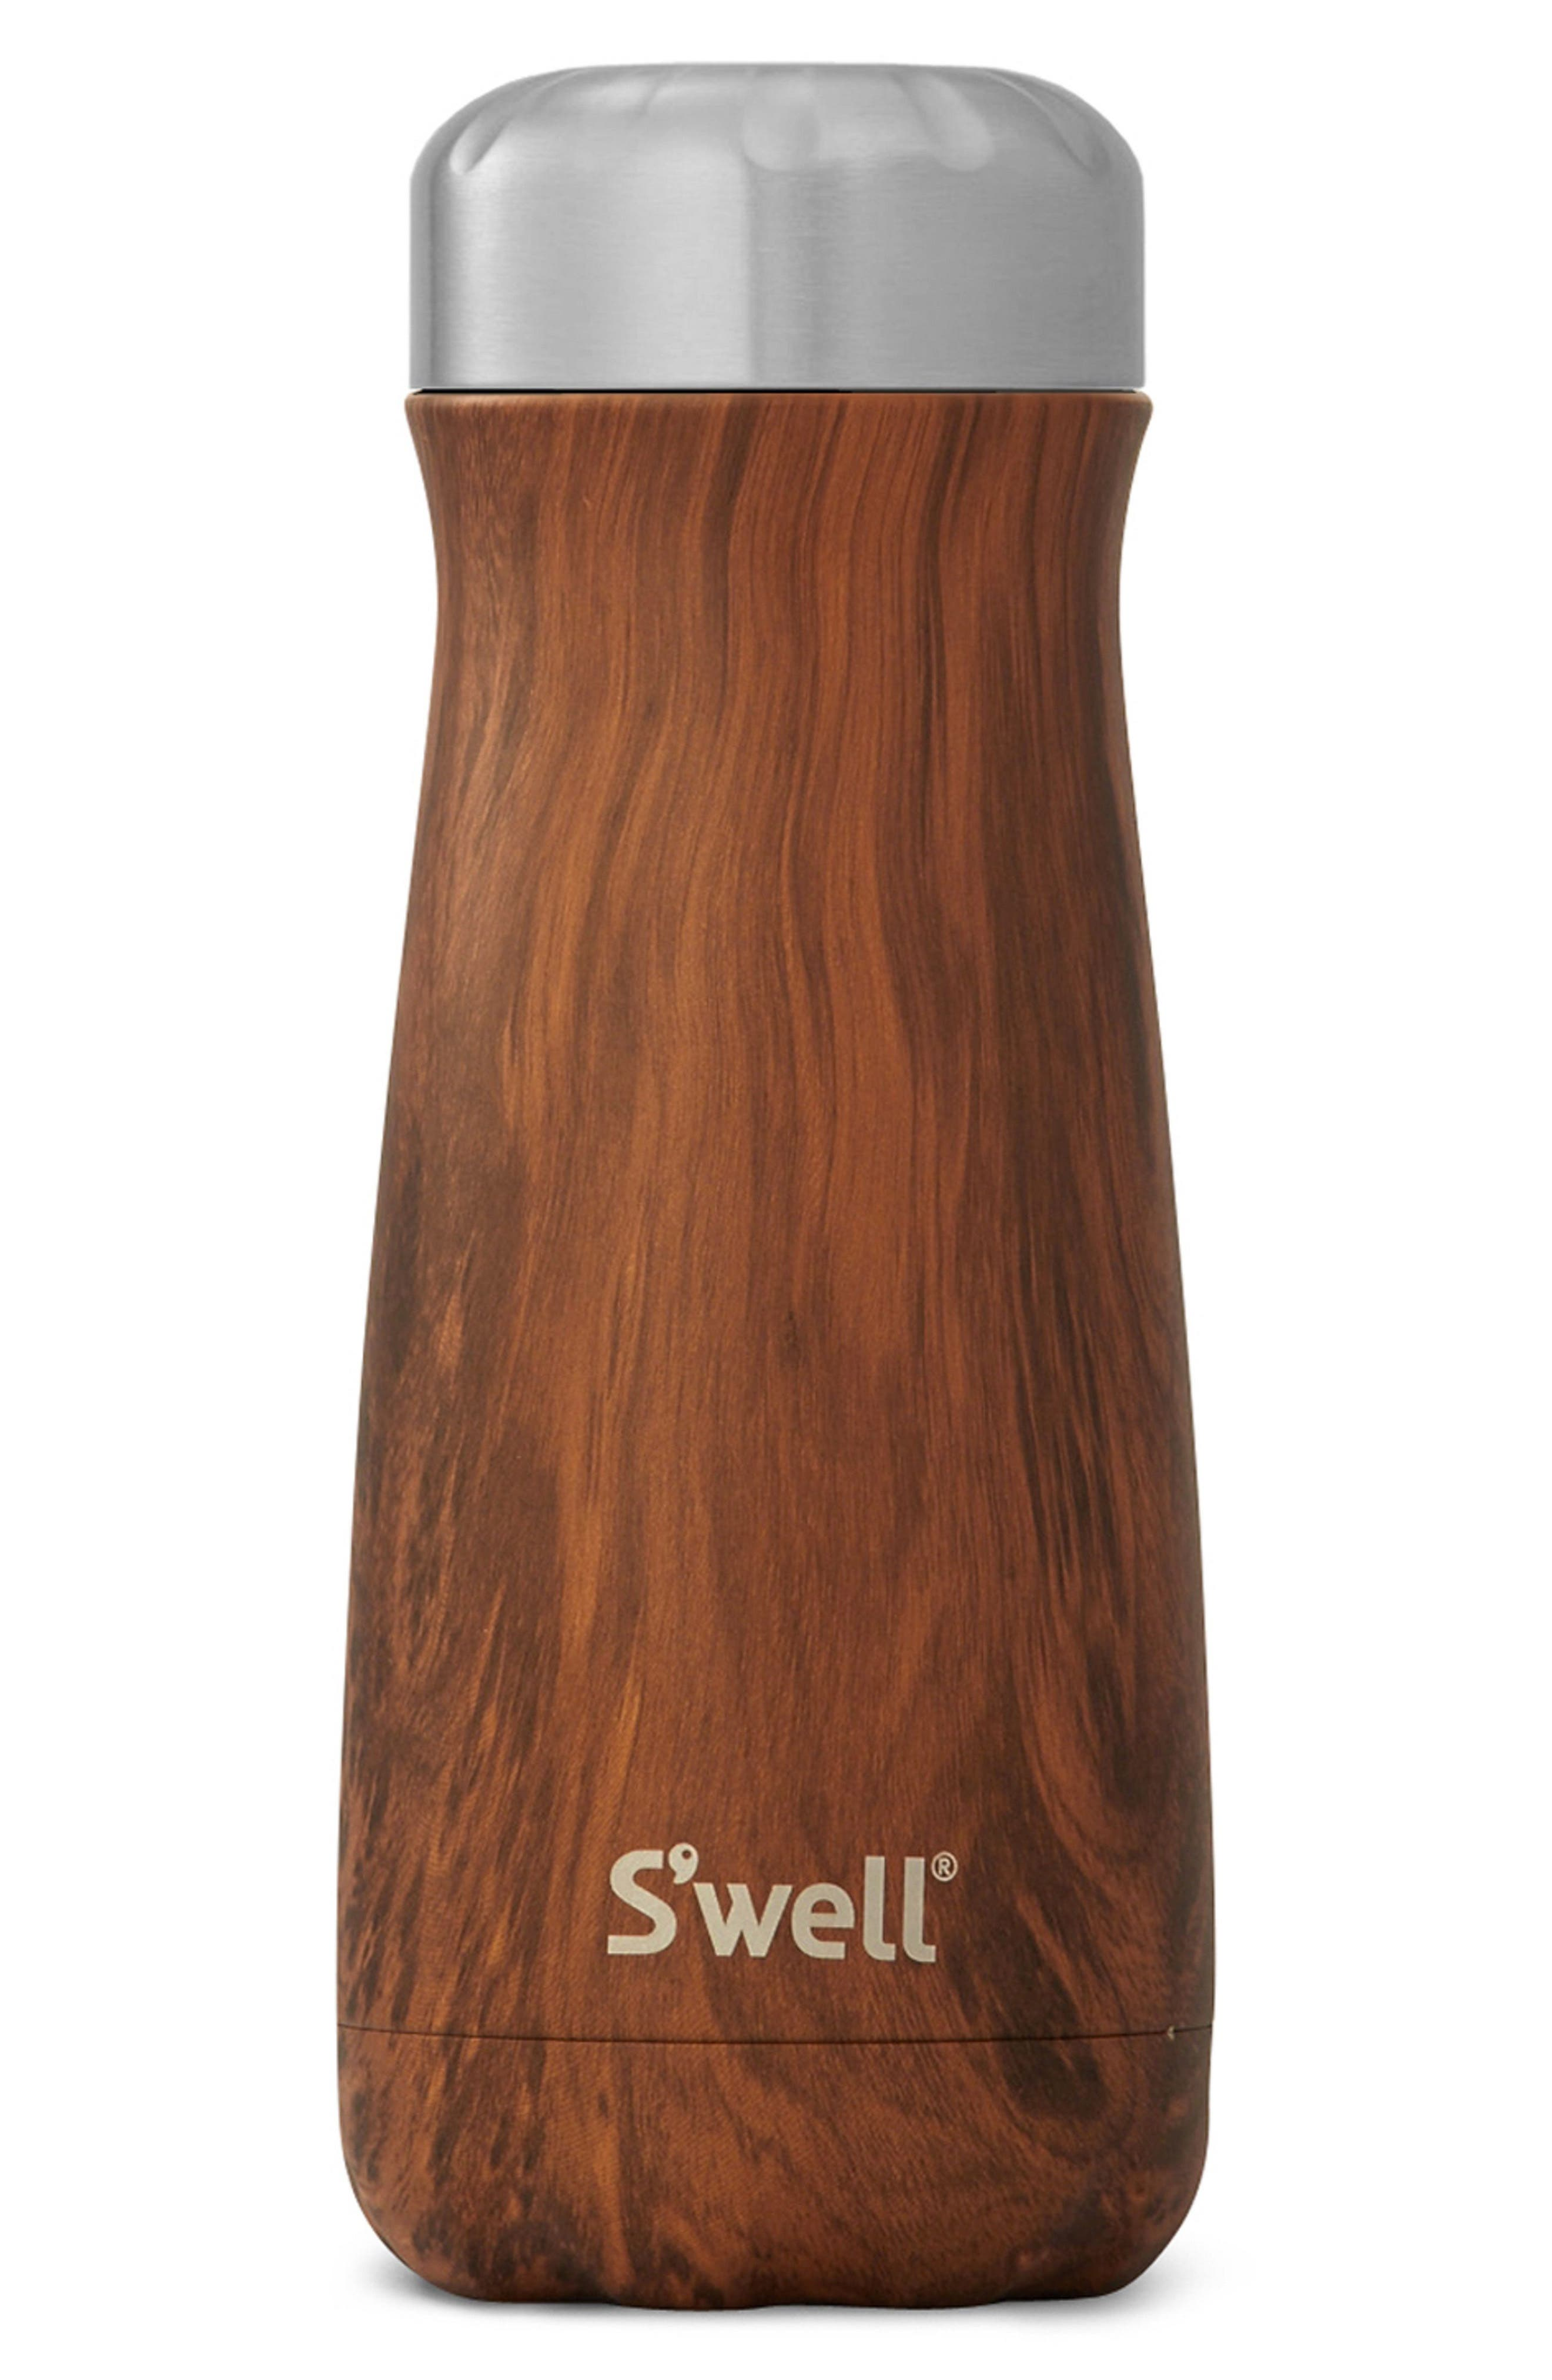 S'well Traveler Teakwood Insulated Stainless Steel Water Bottle